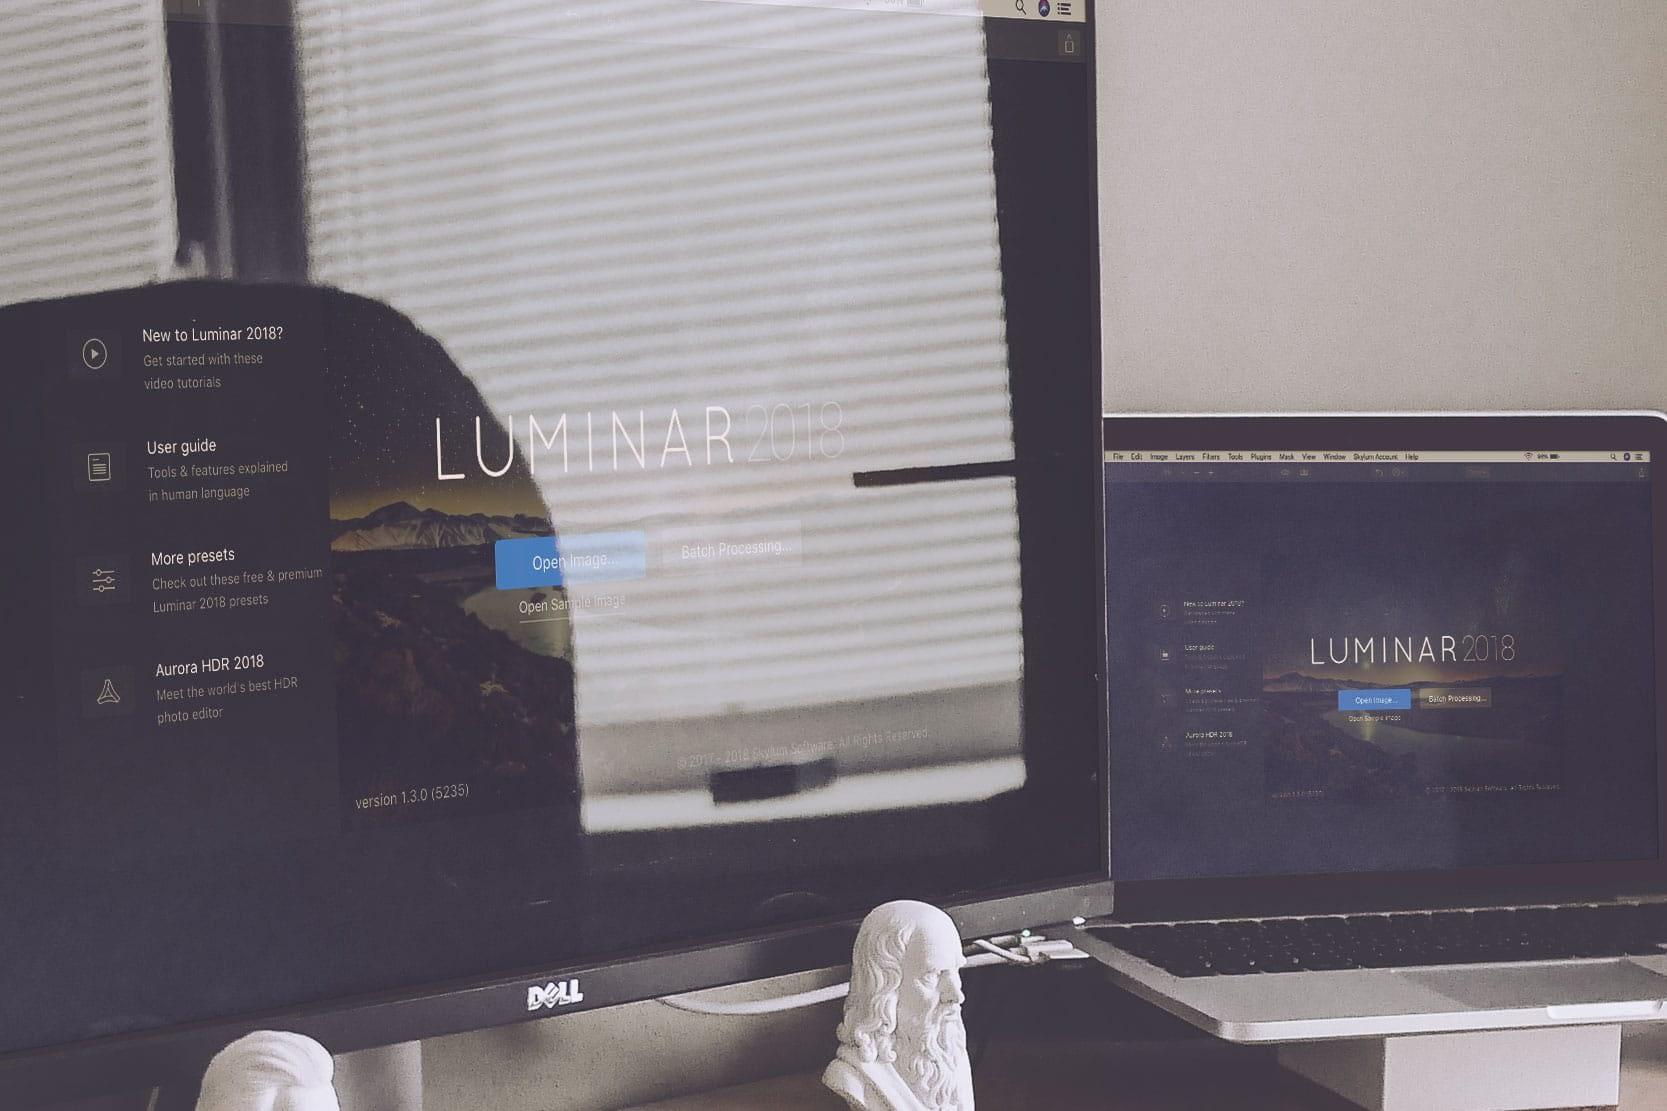 A mockup of Luminar photo editor on Desktop and Laptop